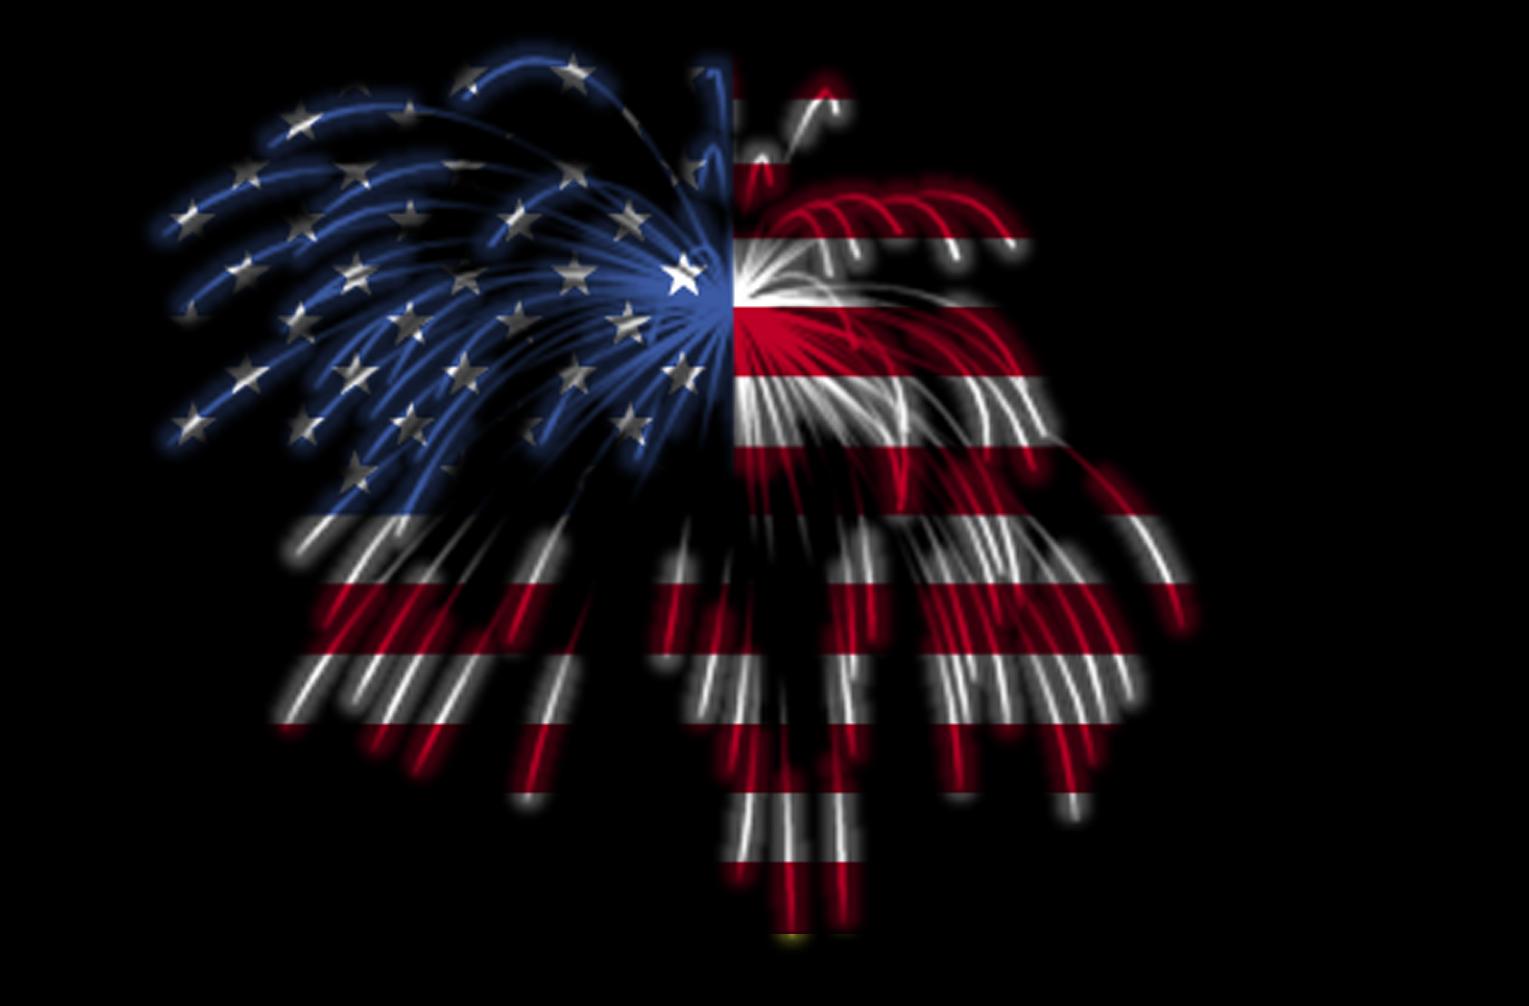 Vintage american flag over july 4th fireworks | Stock